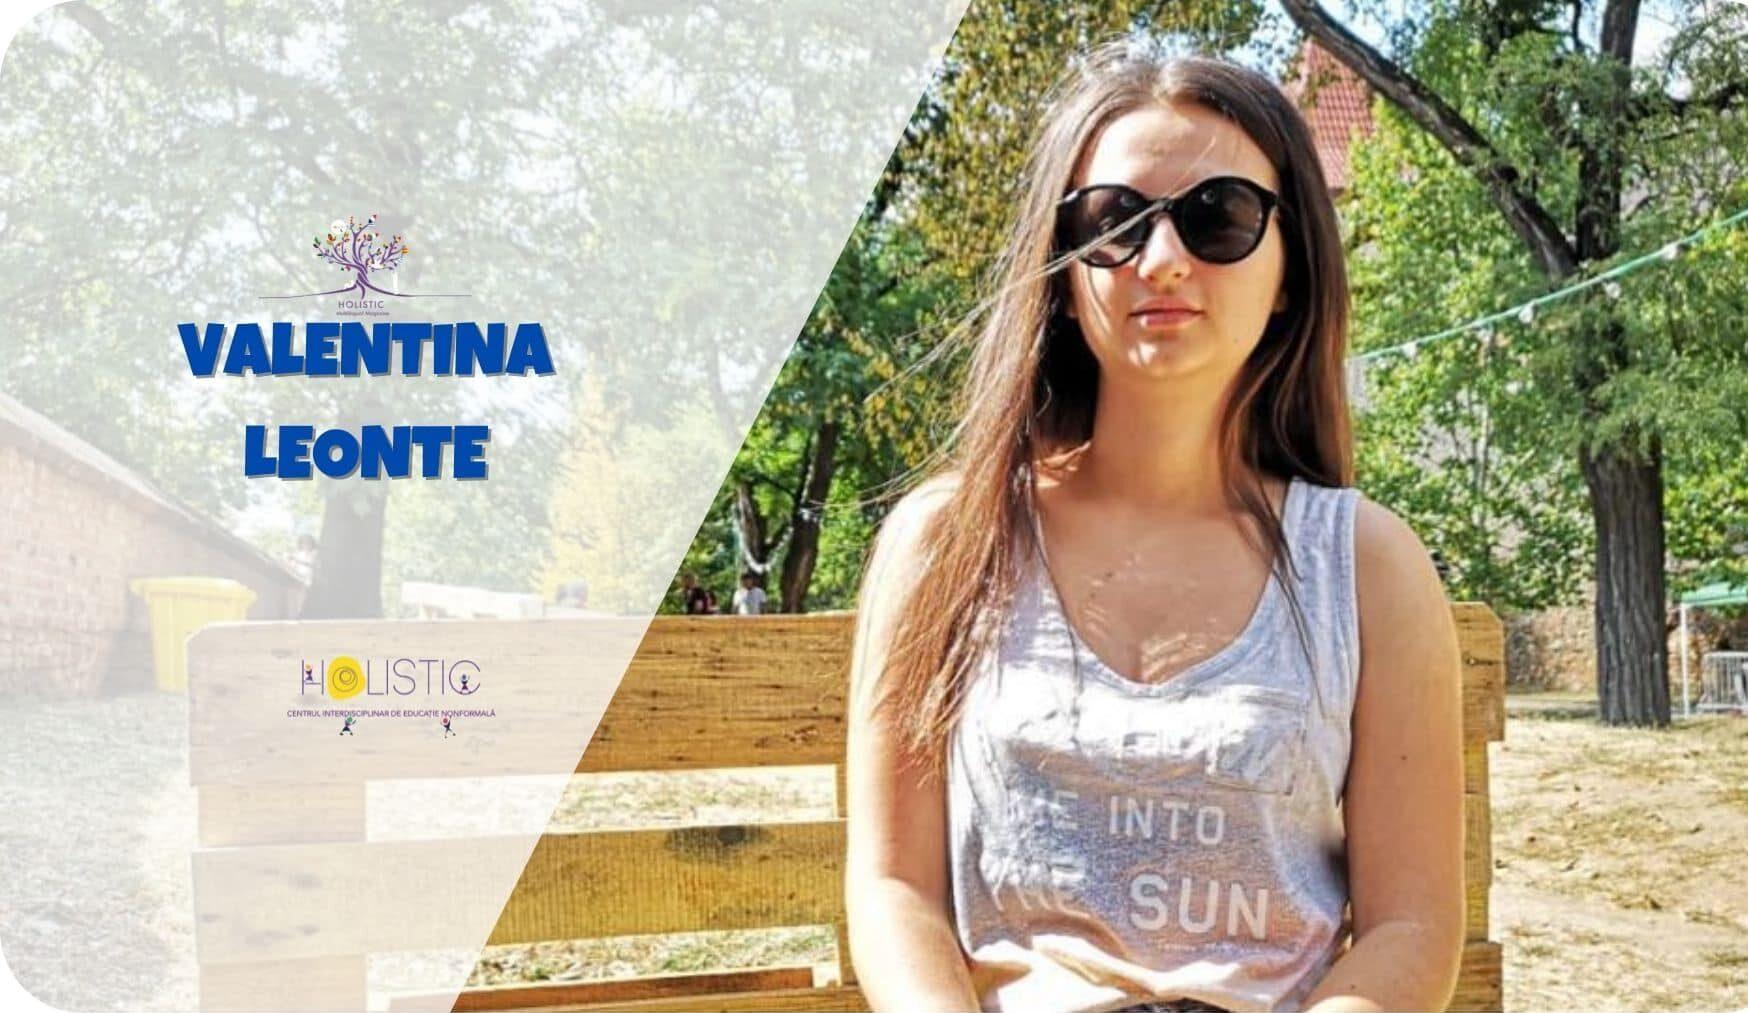 Valentina Leonte